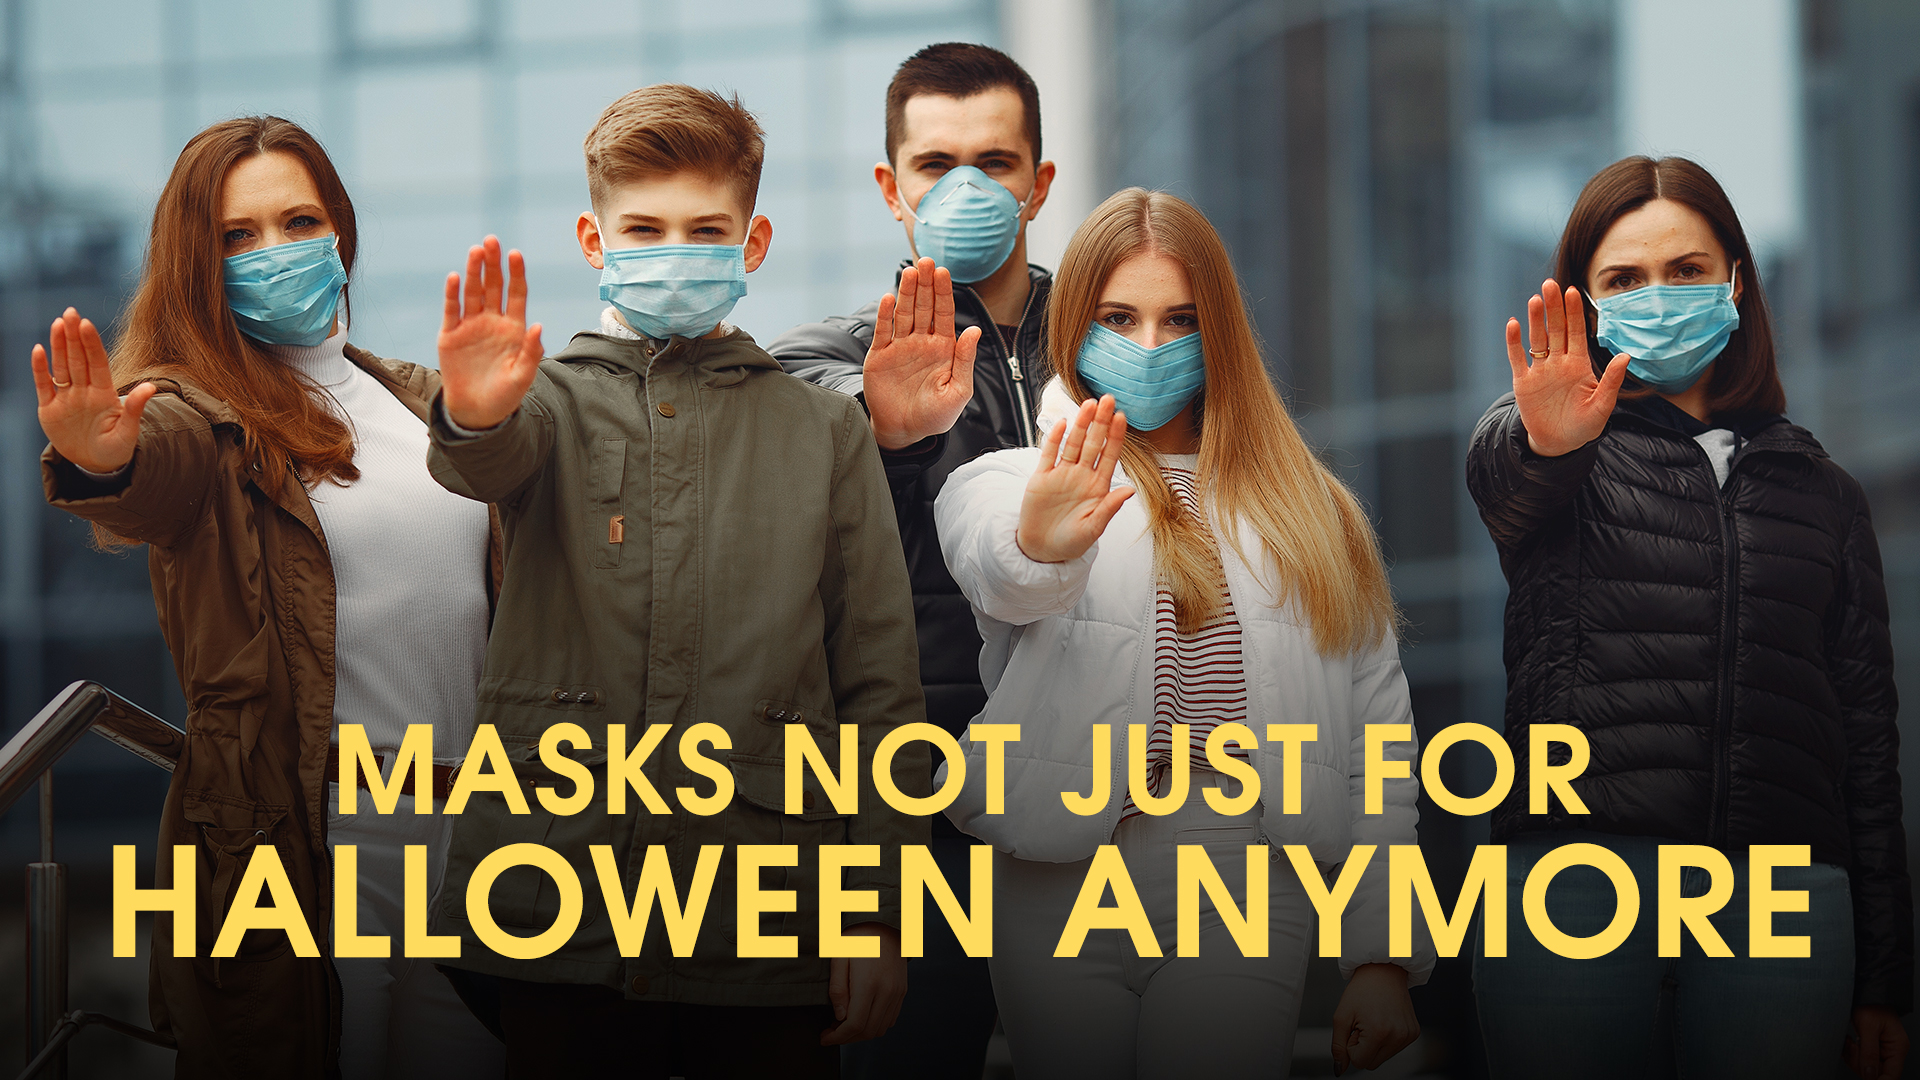 October 2020 Homewardbound Newsletter: Masks Not Just for Halloween Anymore